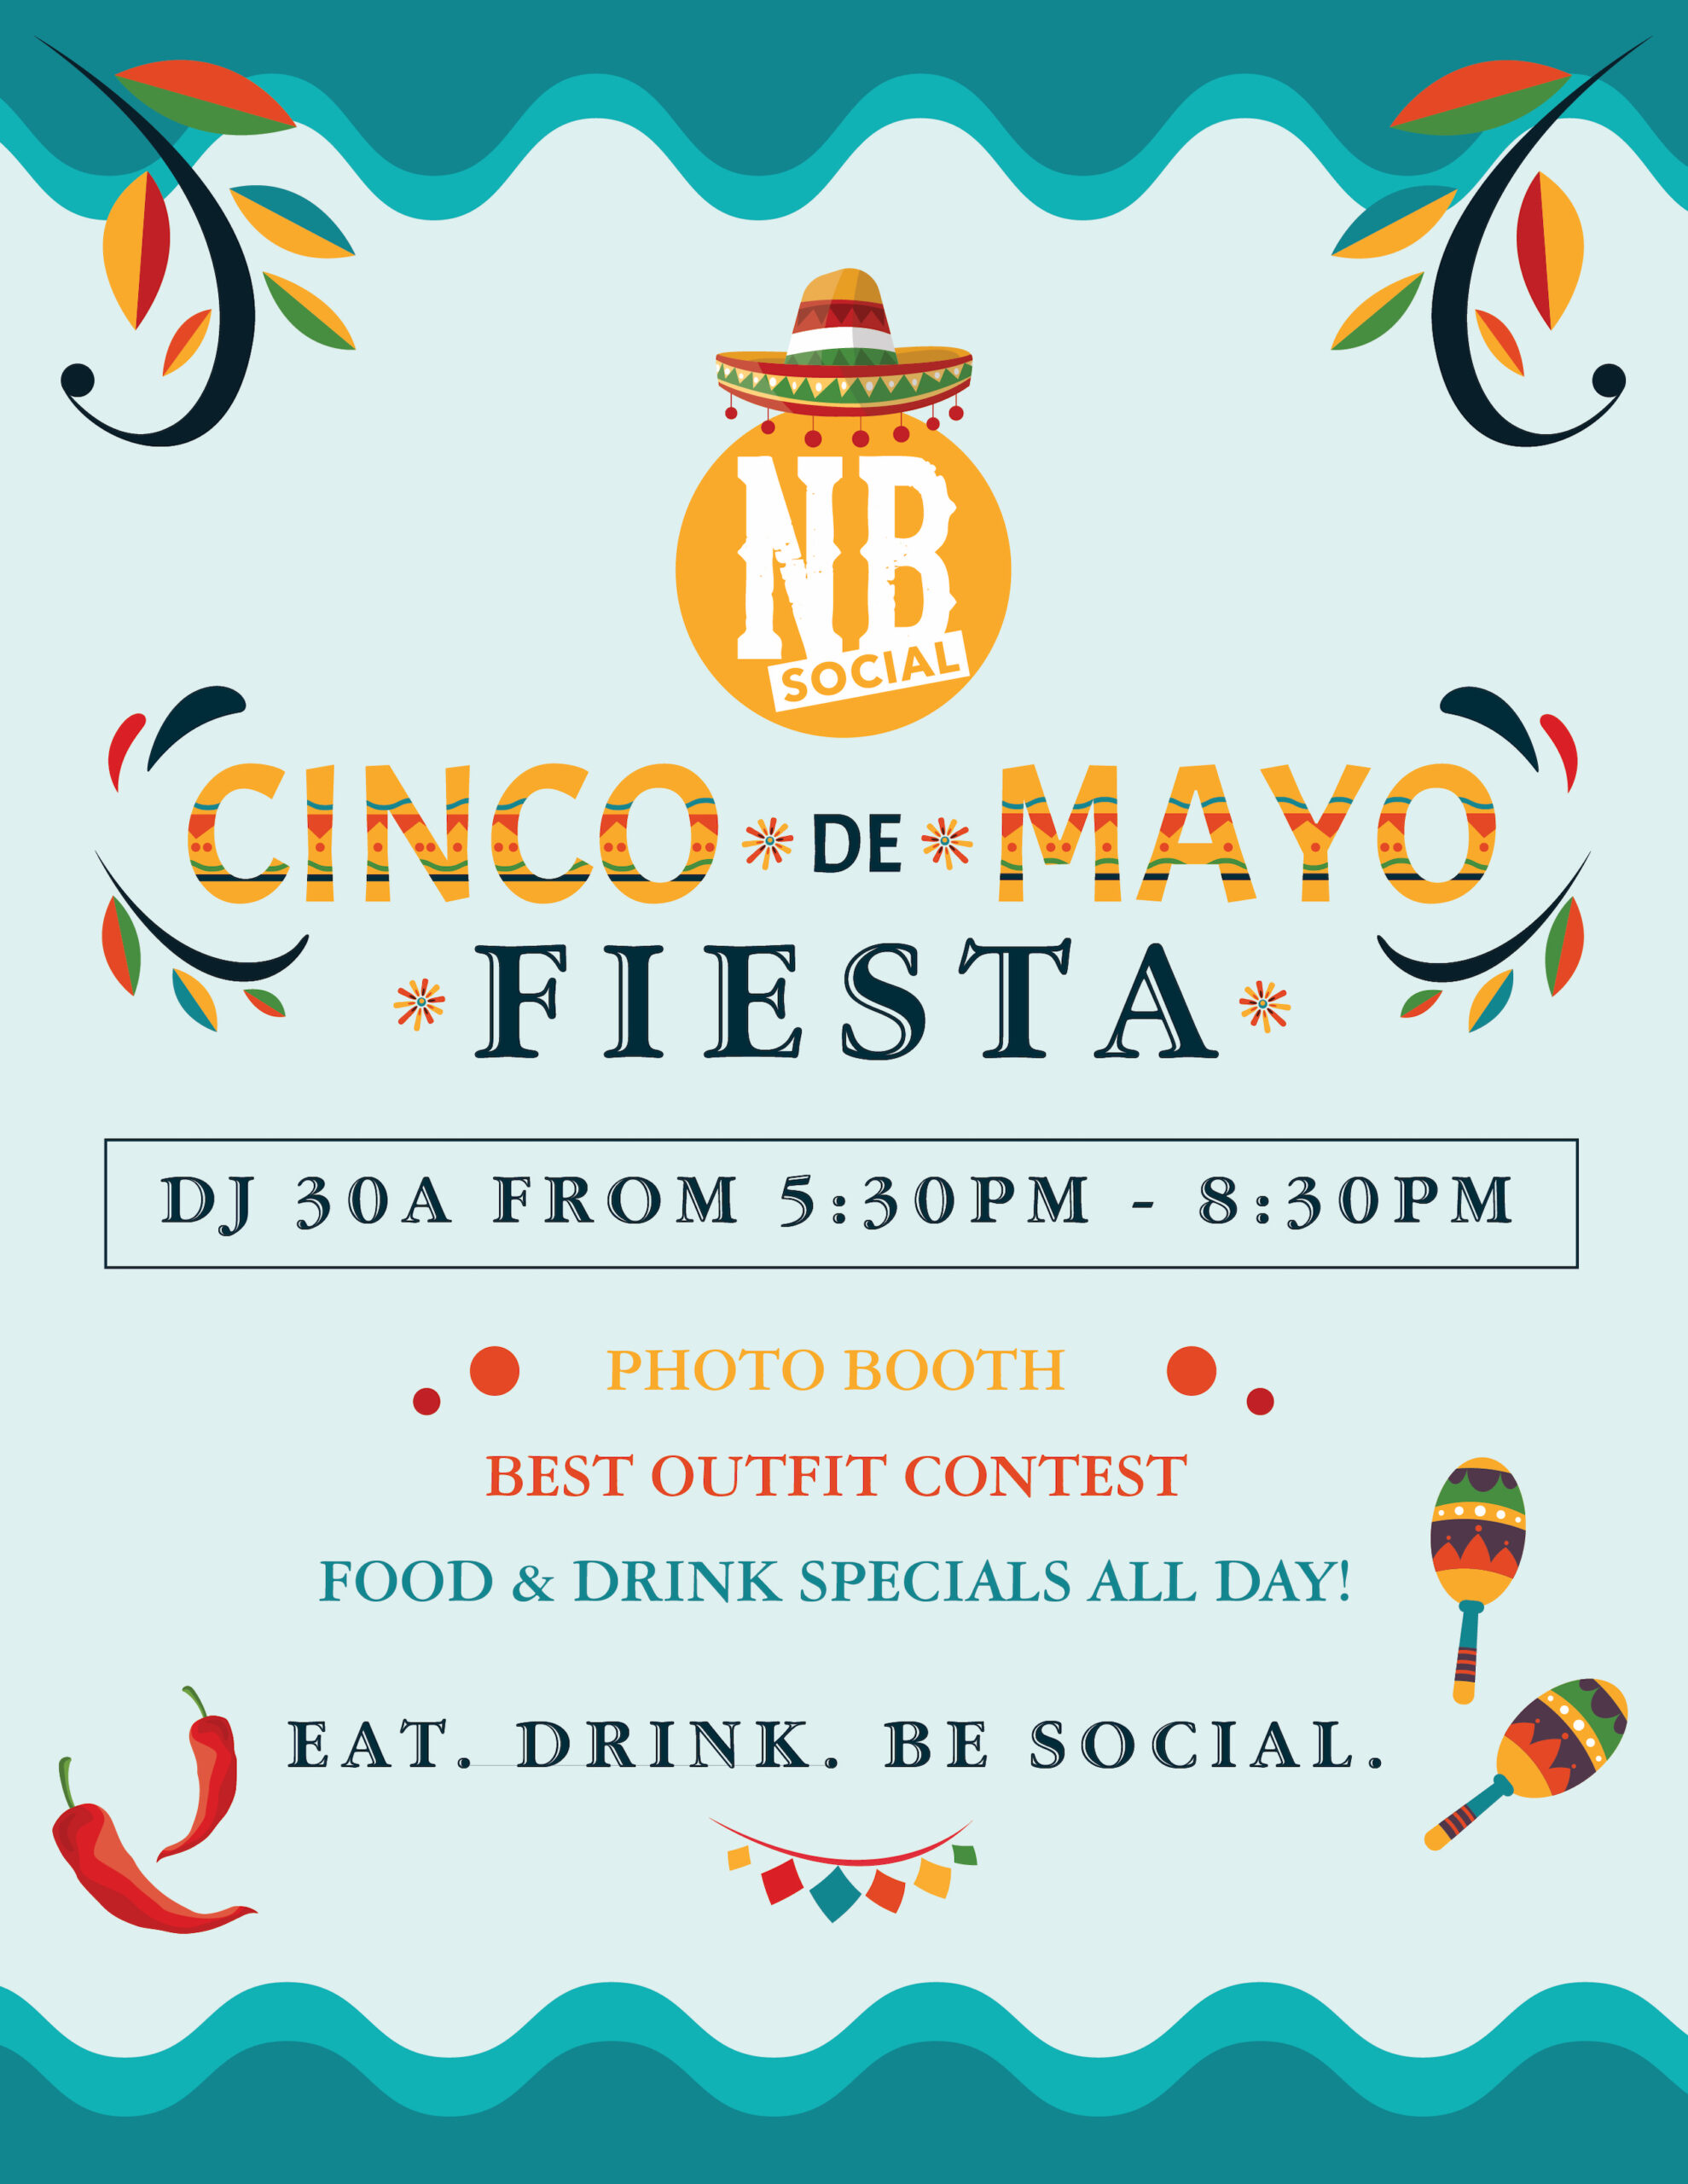 Cinco de Mayo All Day Fiesta at North Beach Social